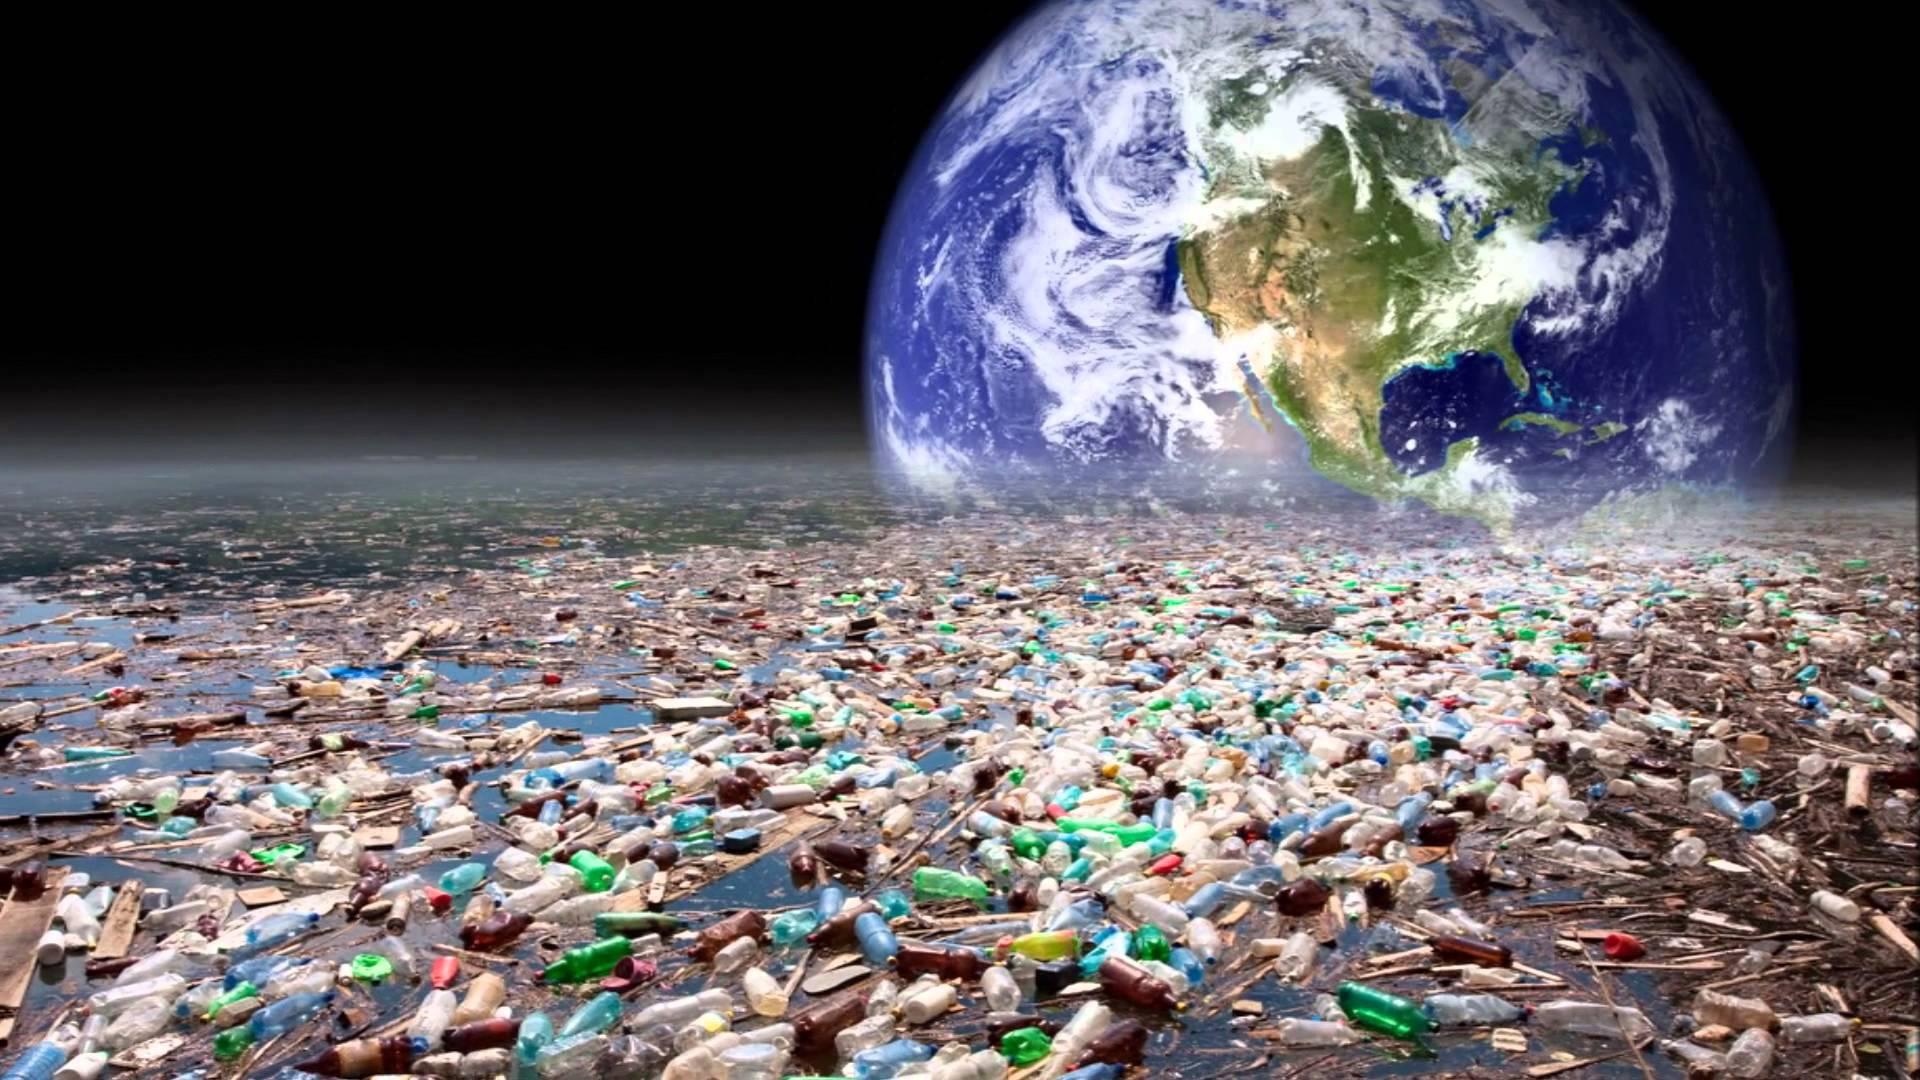 stop-using-plastic-harmful-effects-of-plastic-on-earth.jpg